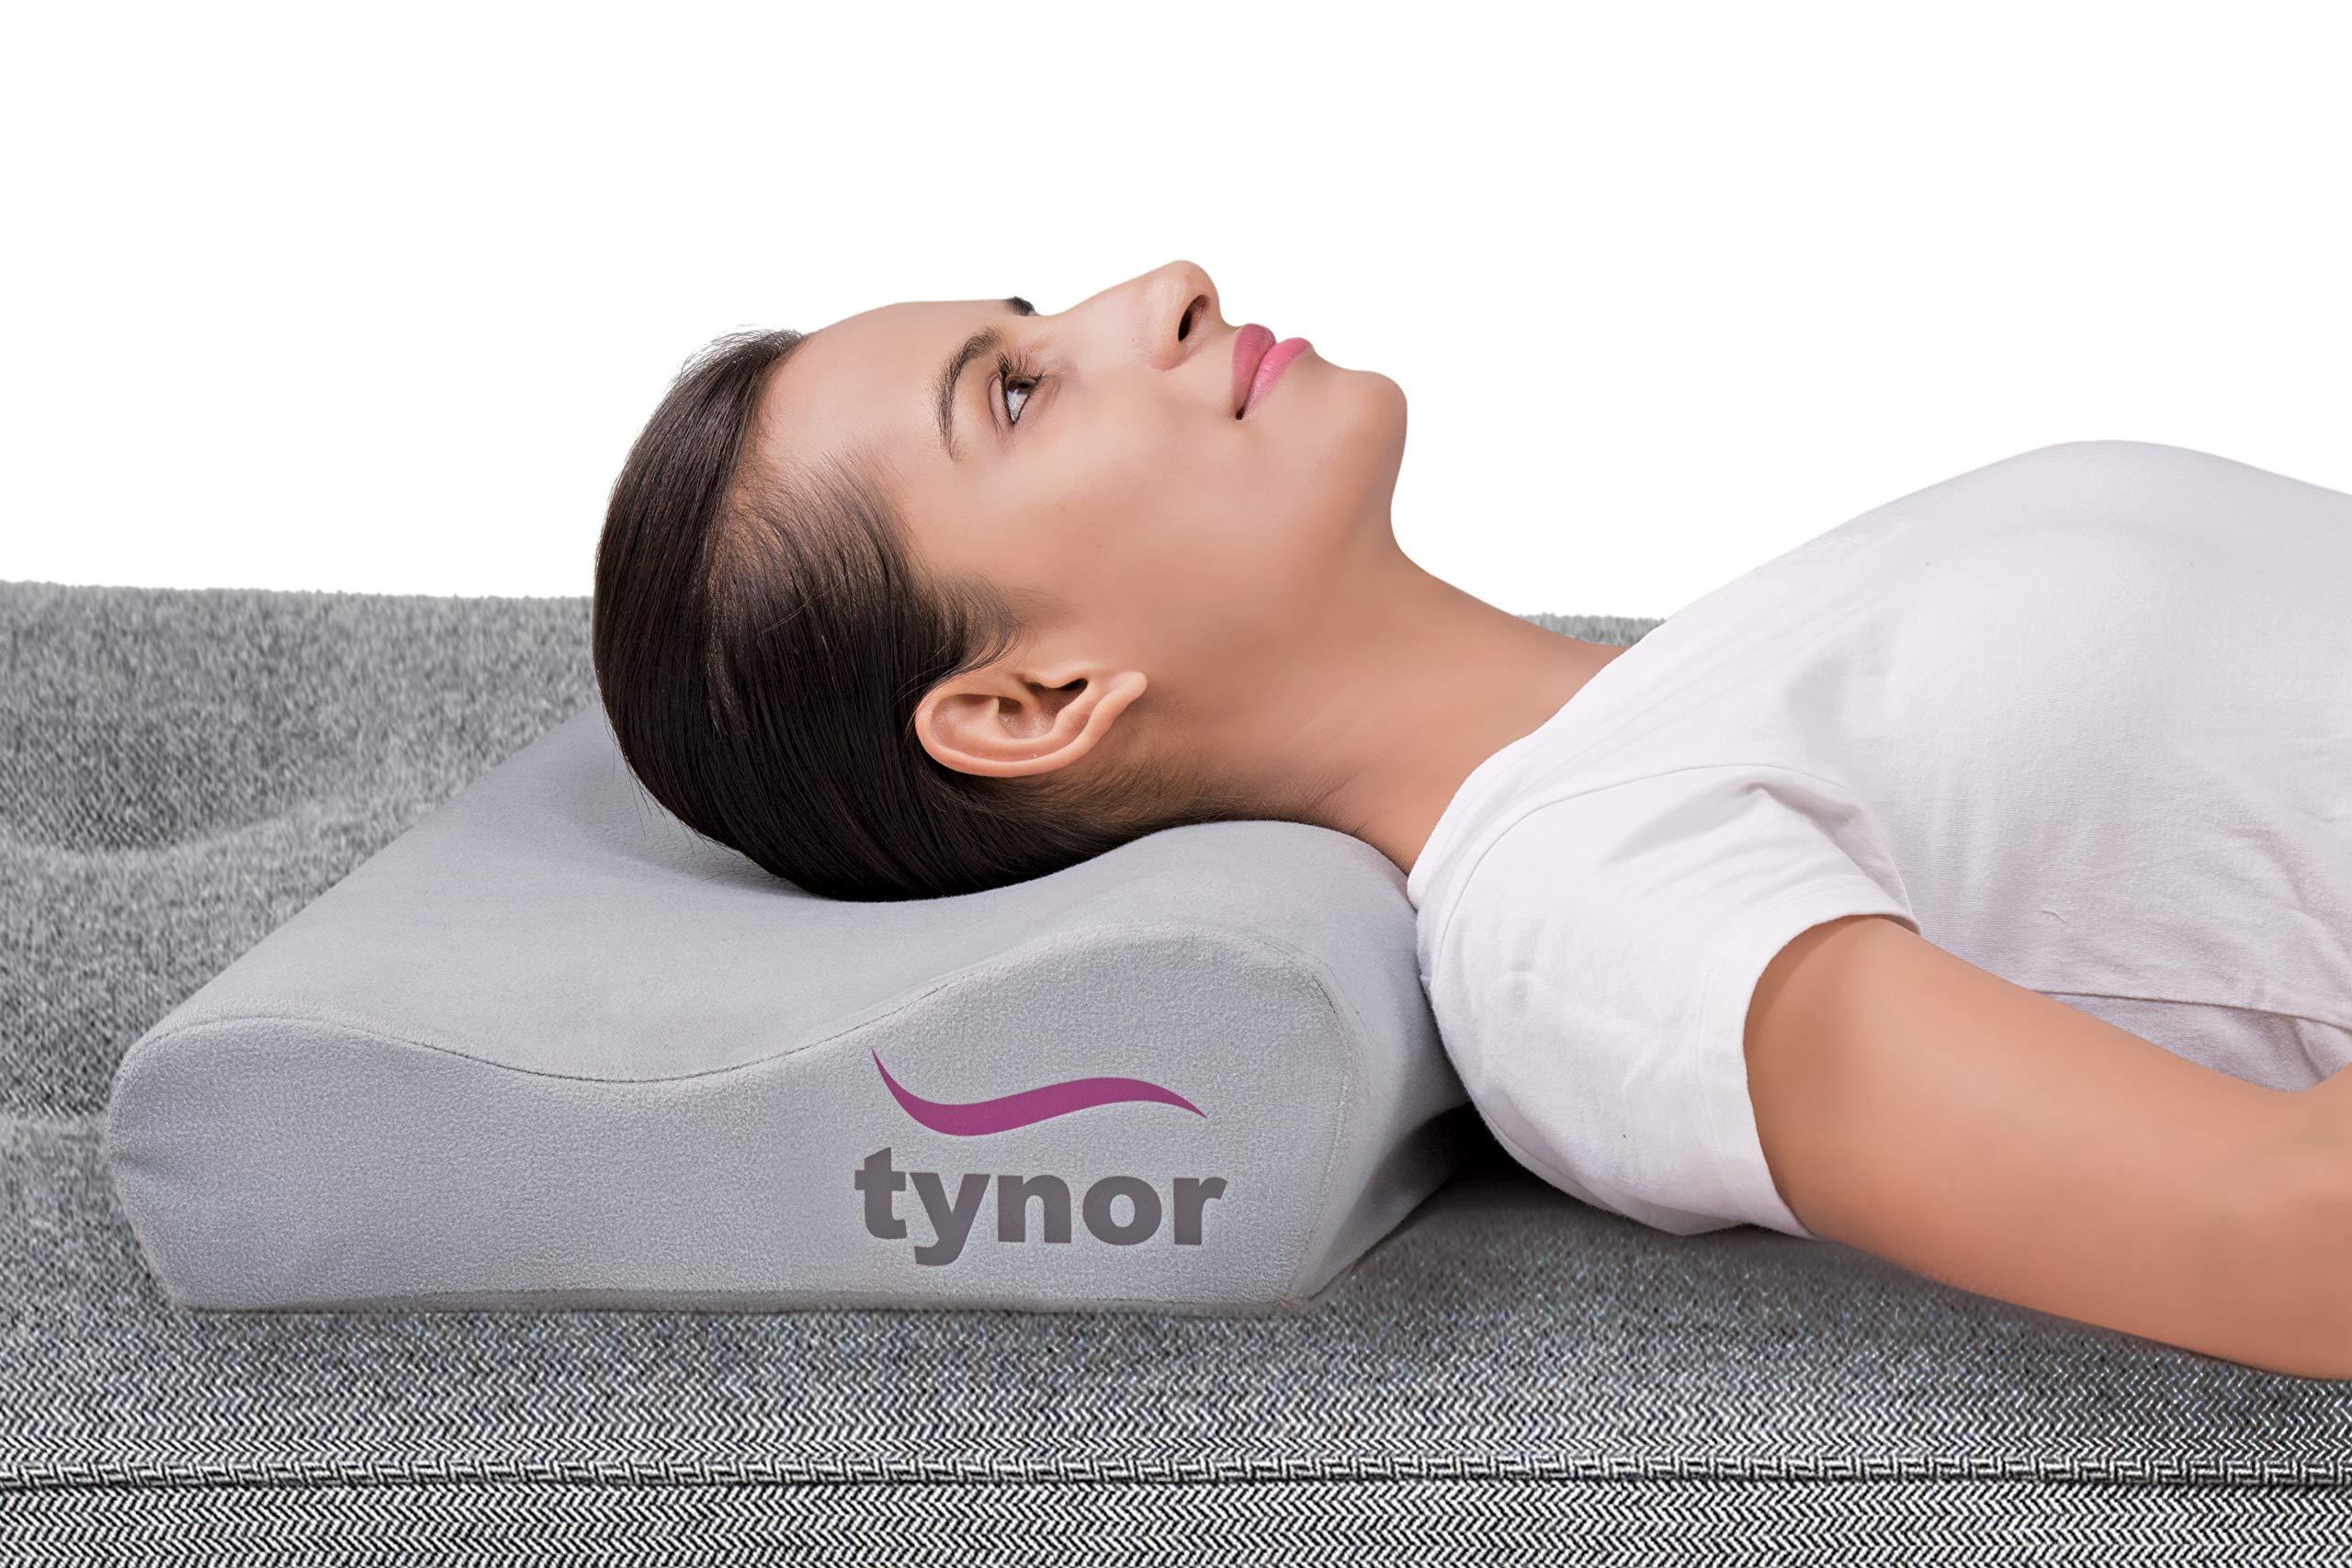 Tynor Contoured Cervical Pillow